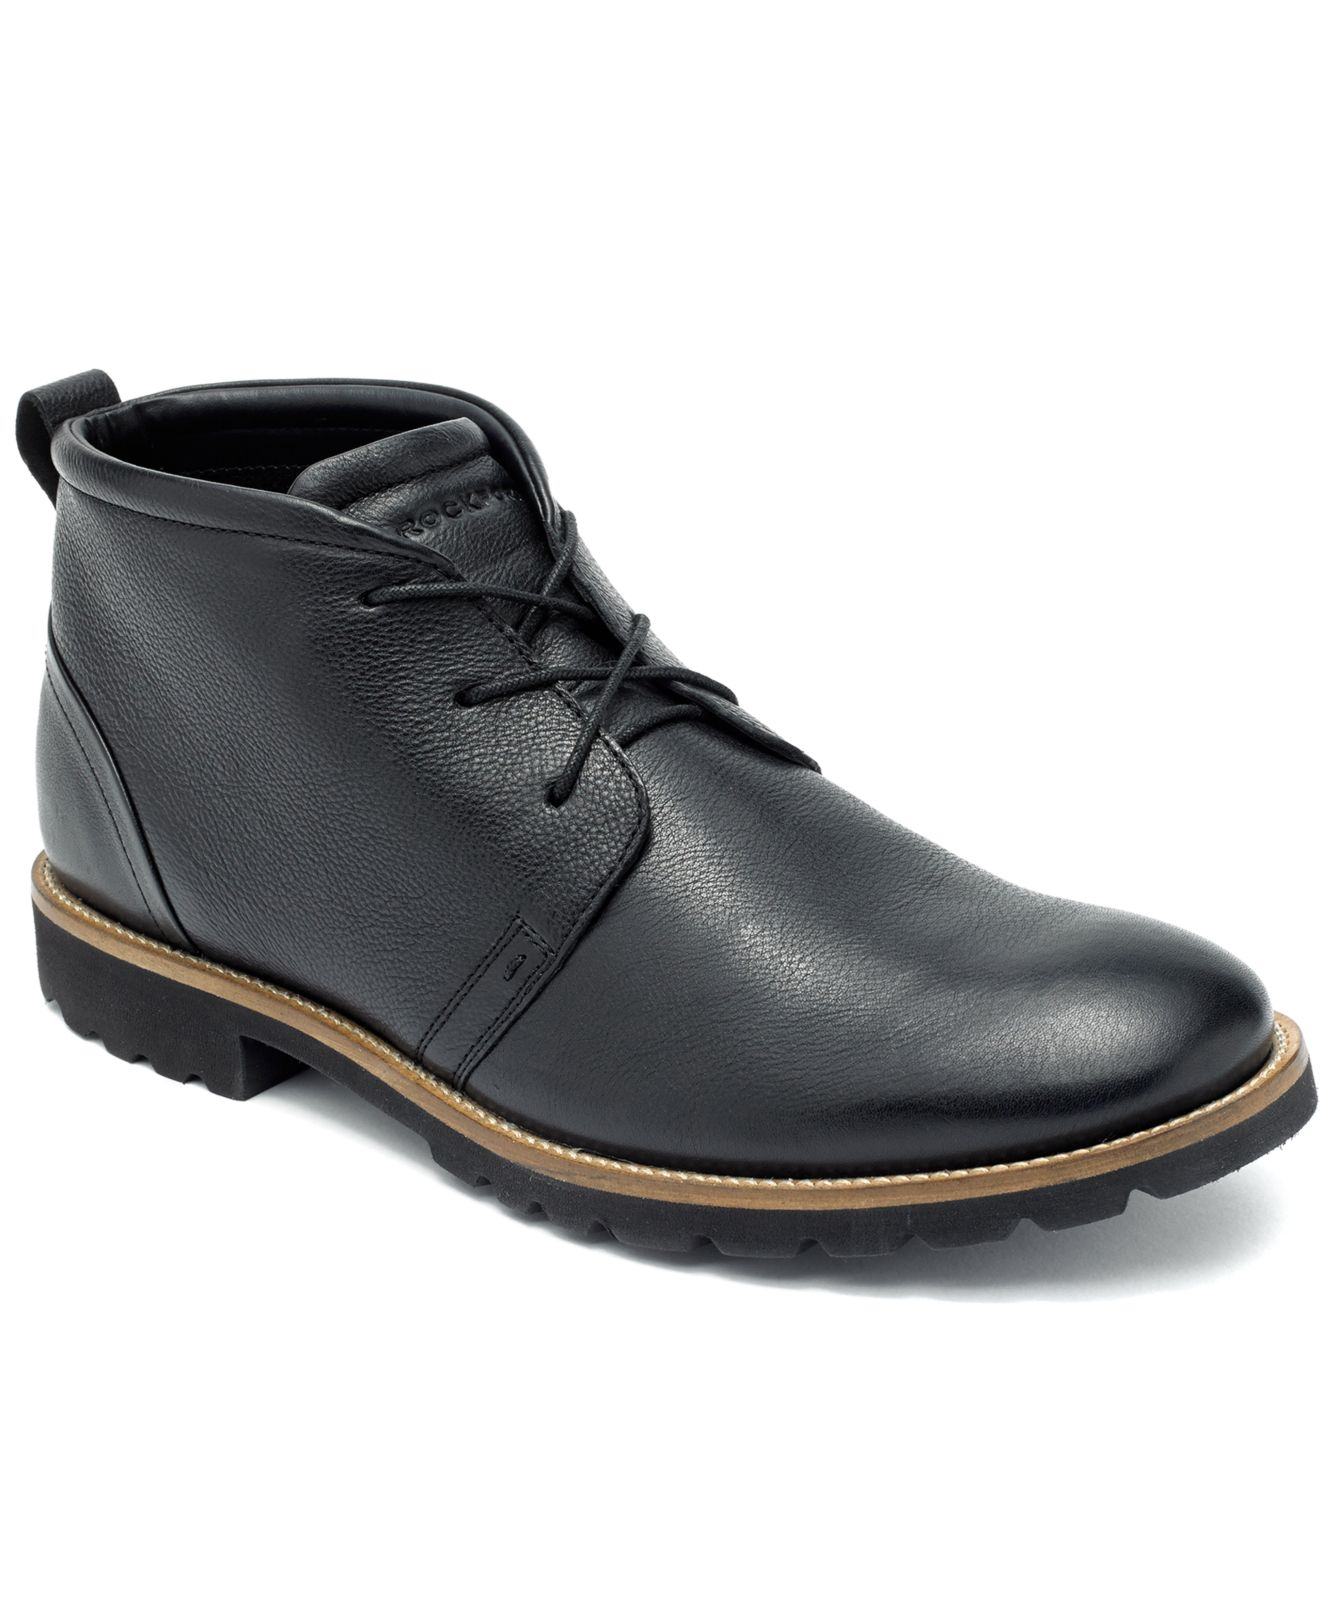 Rockport Charson Chukka Boots